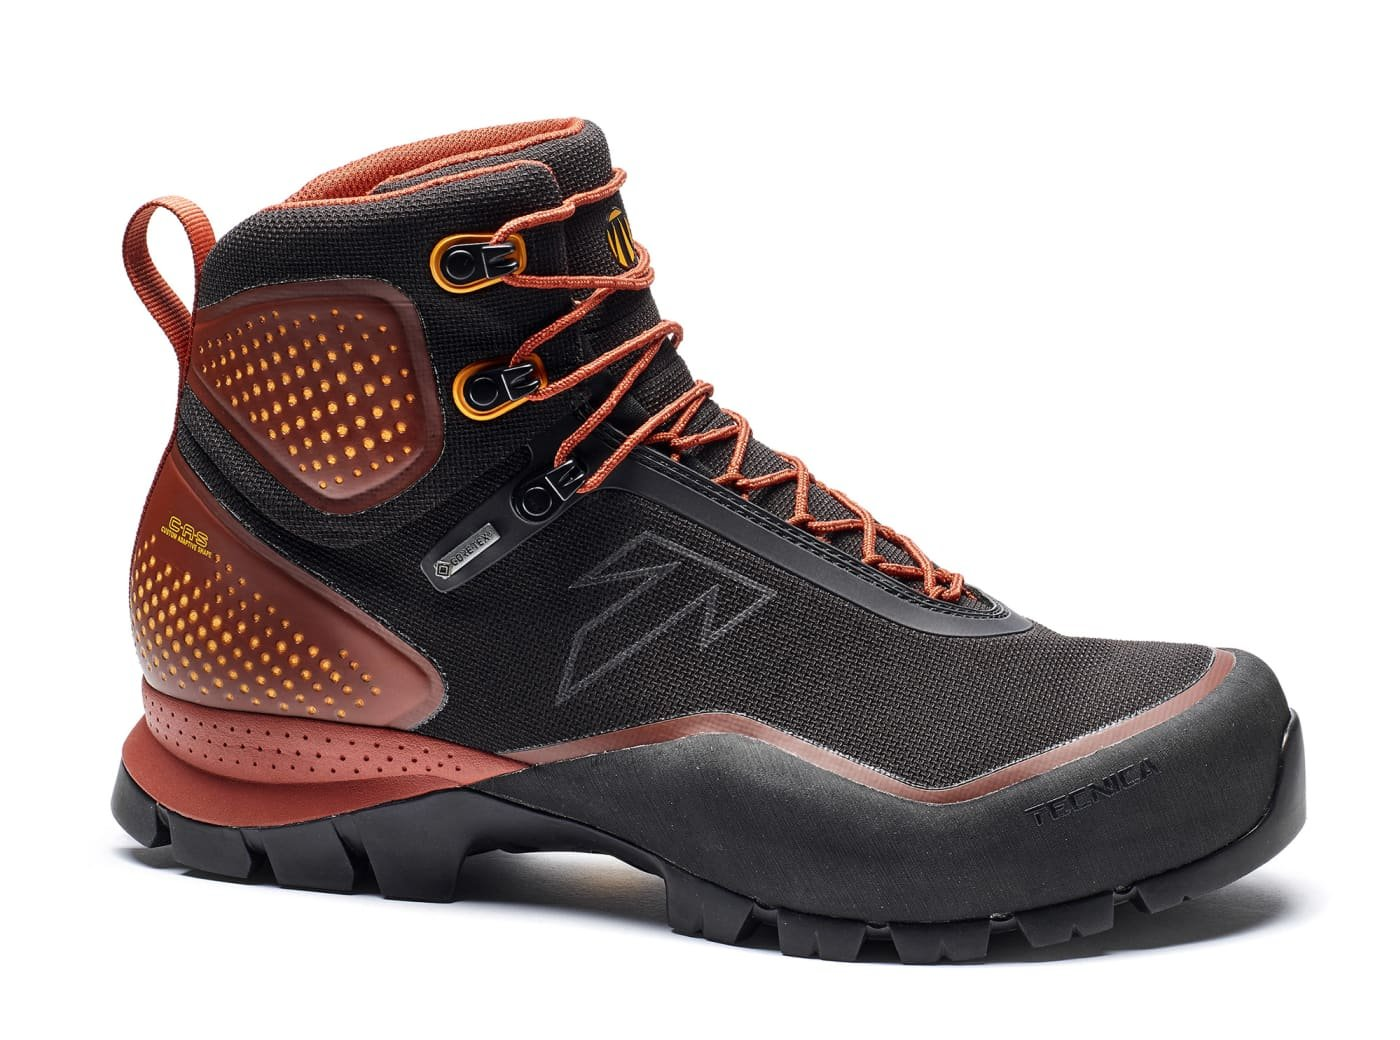 Tecnica Forge S GTX MS Hiking Boot -Shadow Giungla-DY Campo